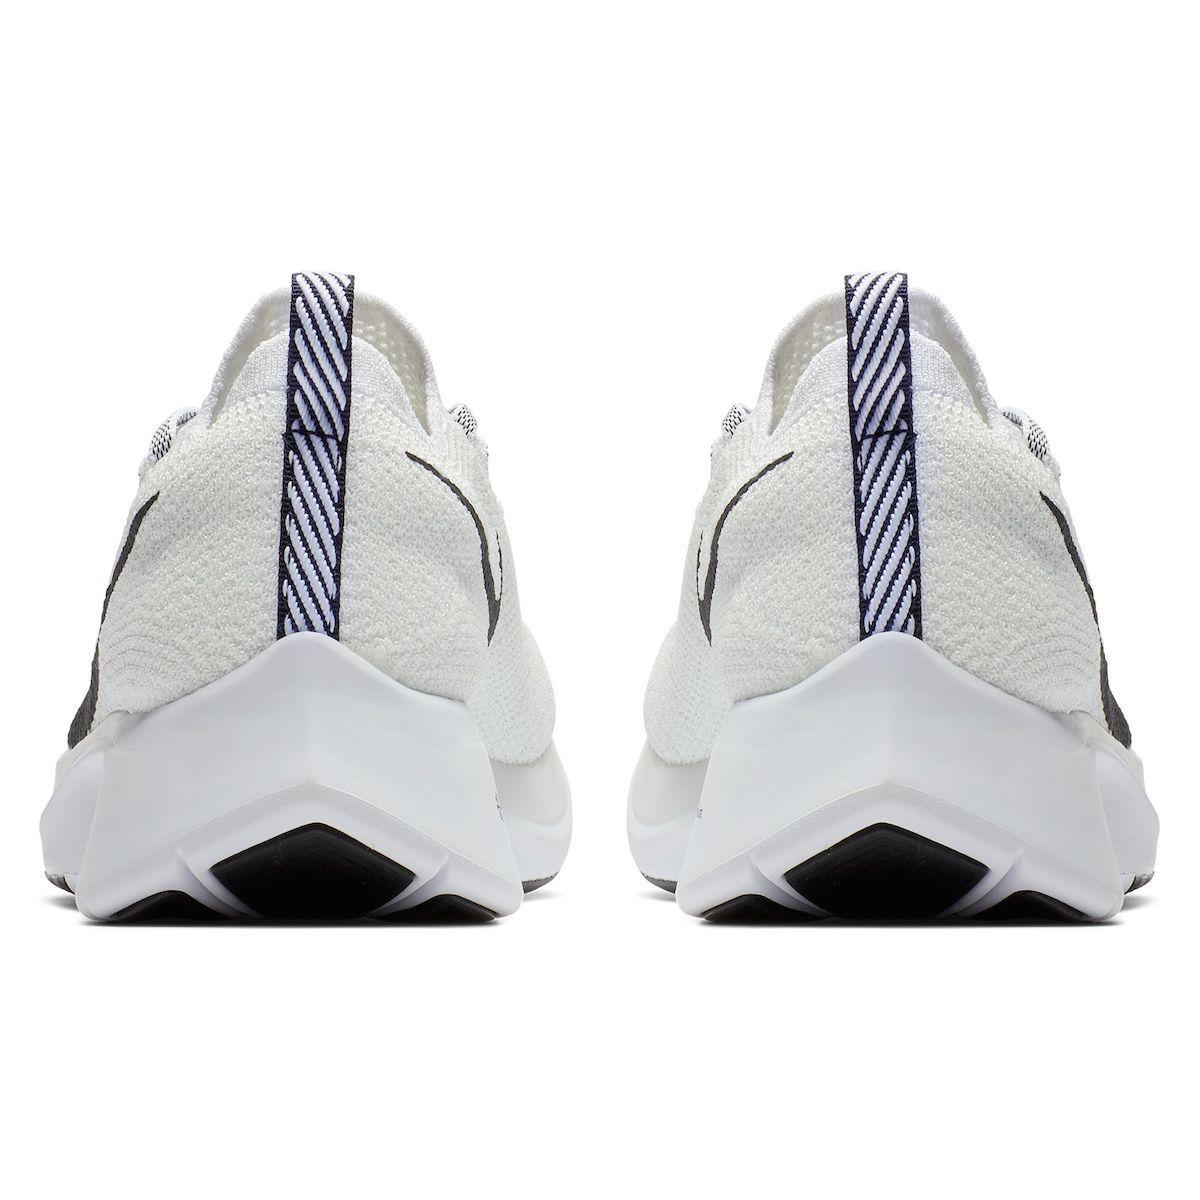 خرید                      کفش  دویدن مردانه نایکی مدل ZOOM FLY FK FLYNIT